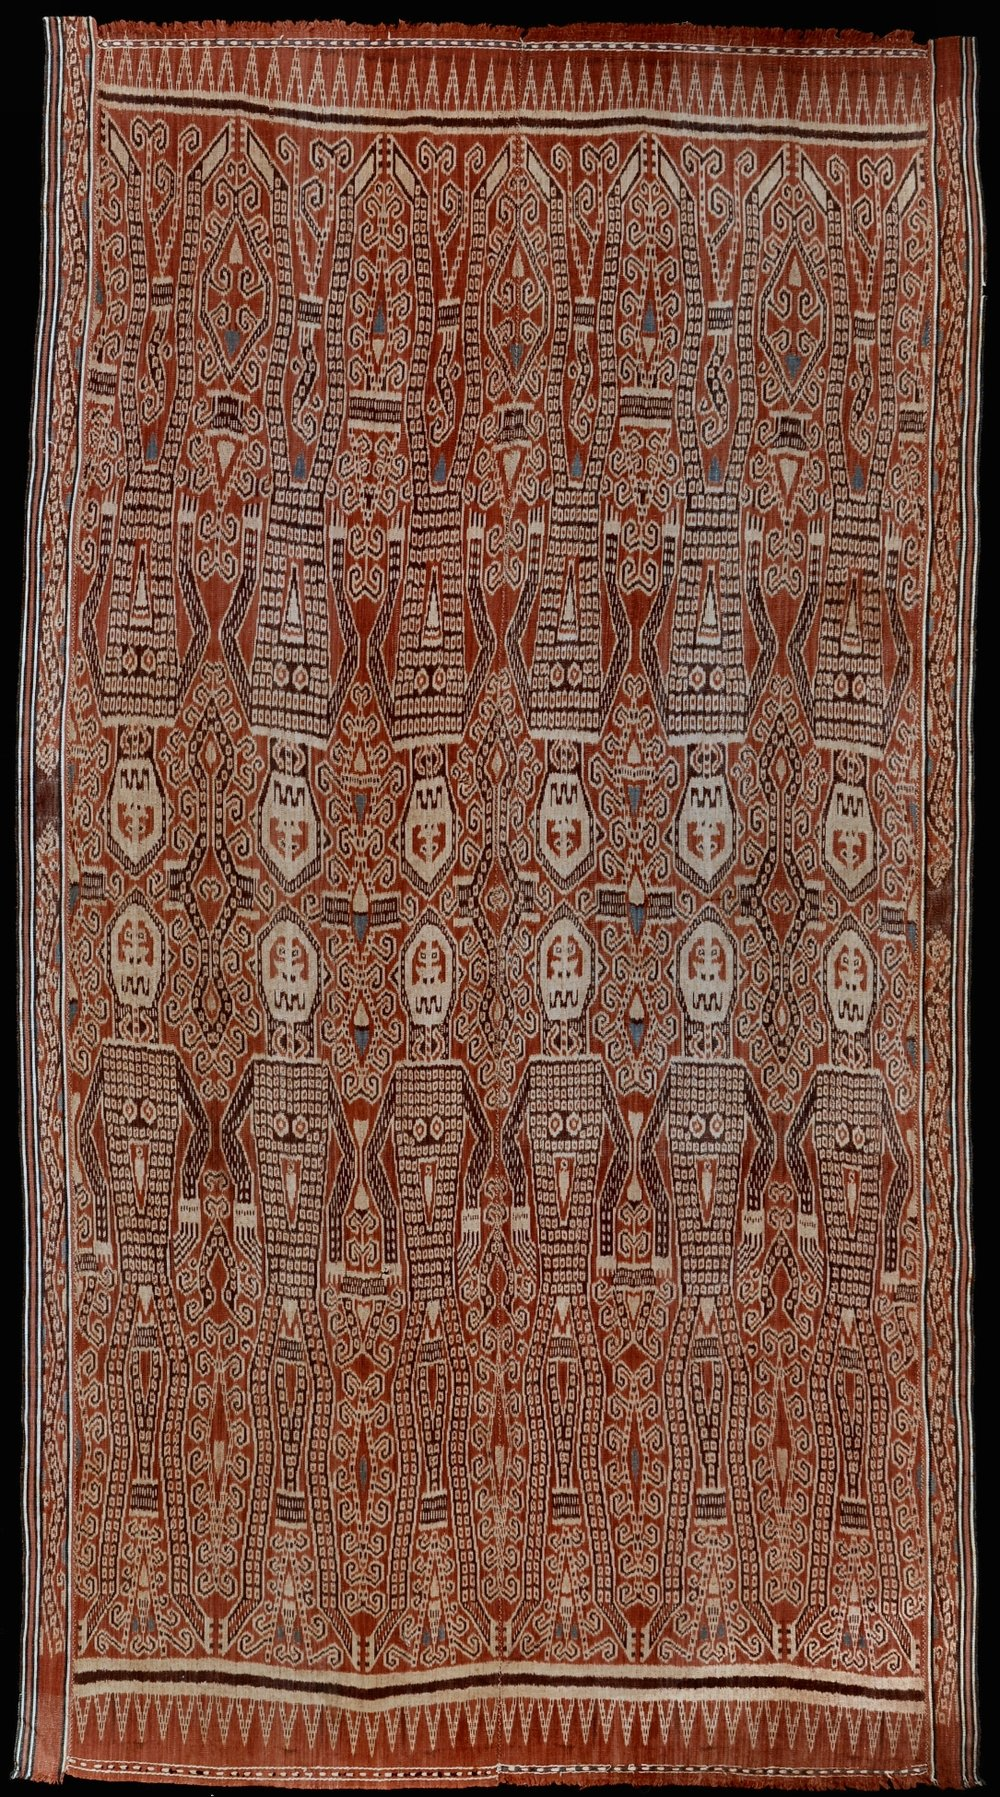 Borneo, Sarawak Iban people Pua, ritual blanket Warp ikat in hand-spun cotton 1925–1945